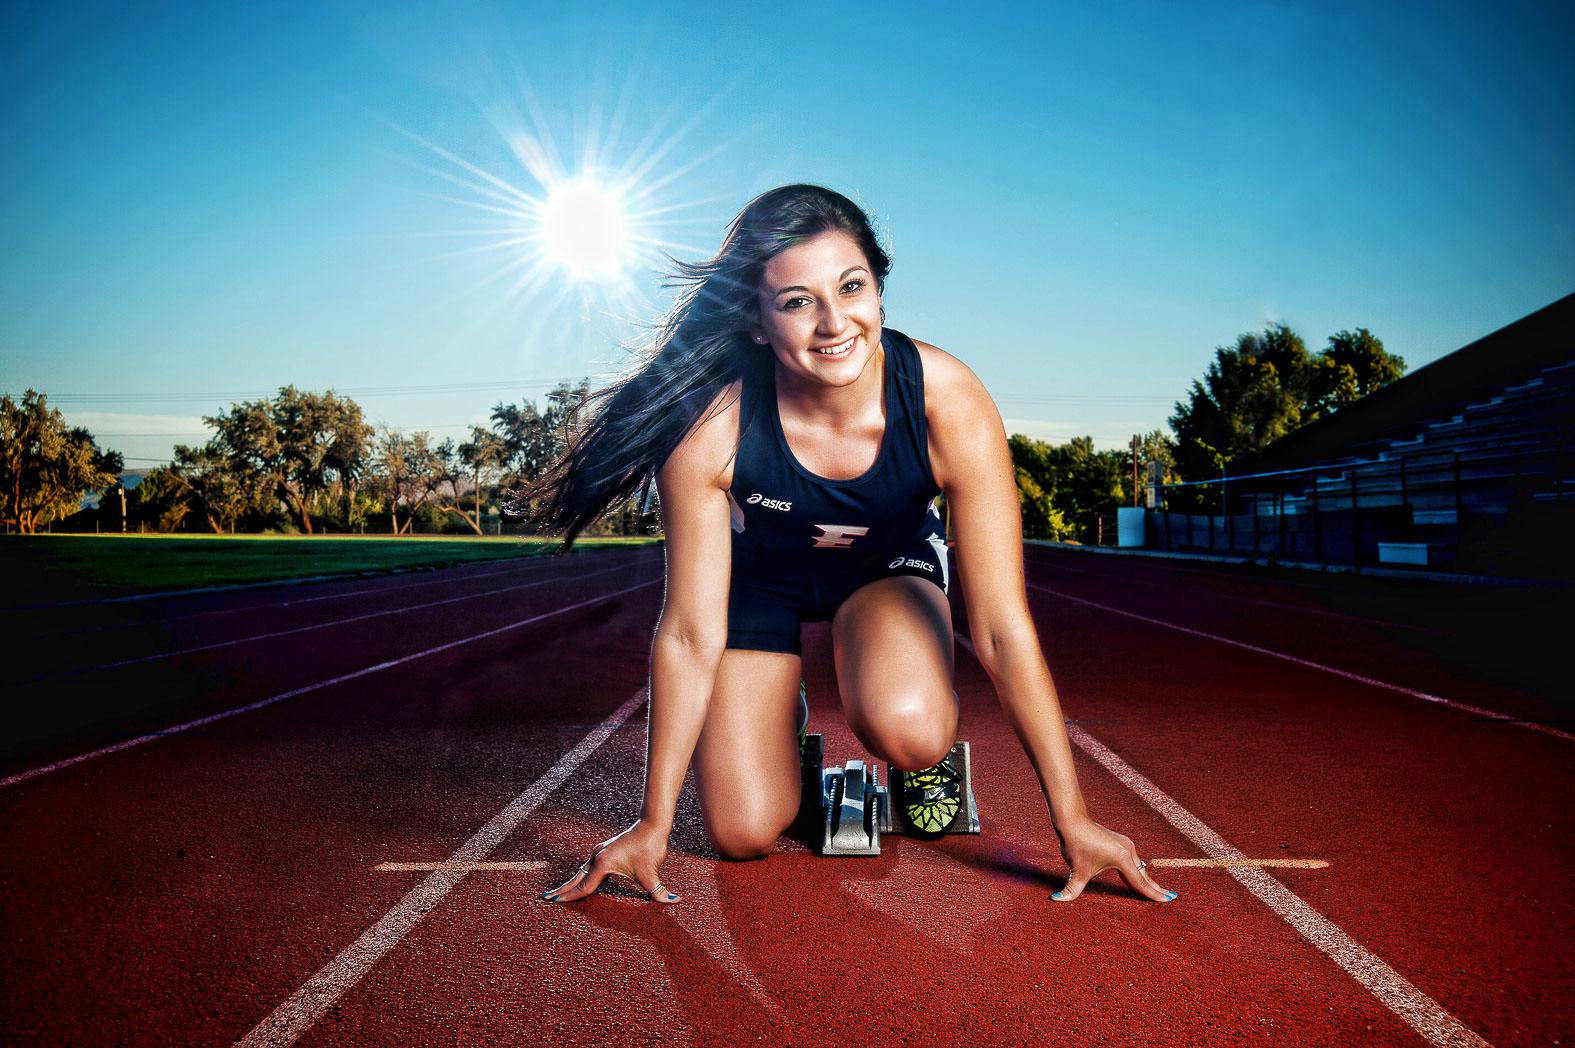 12-photonuvo-senior-pictures-sports-track